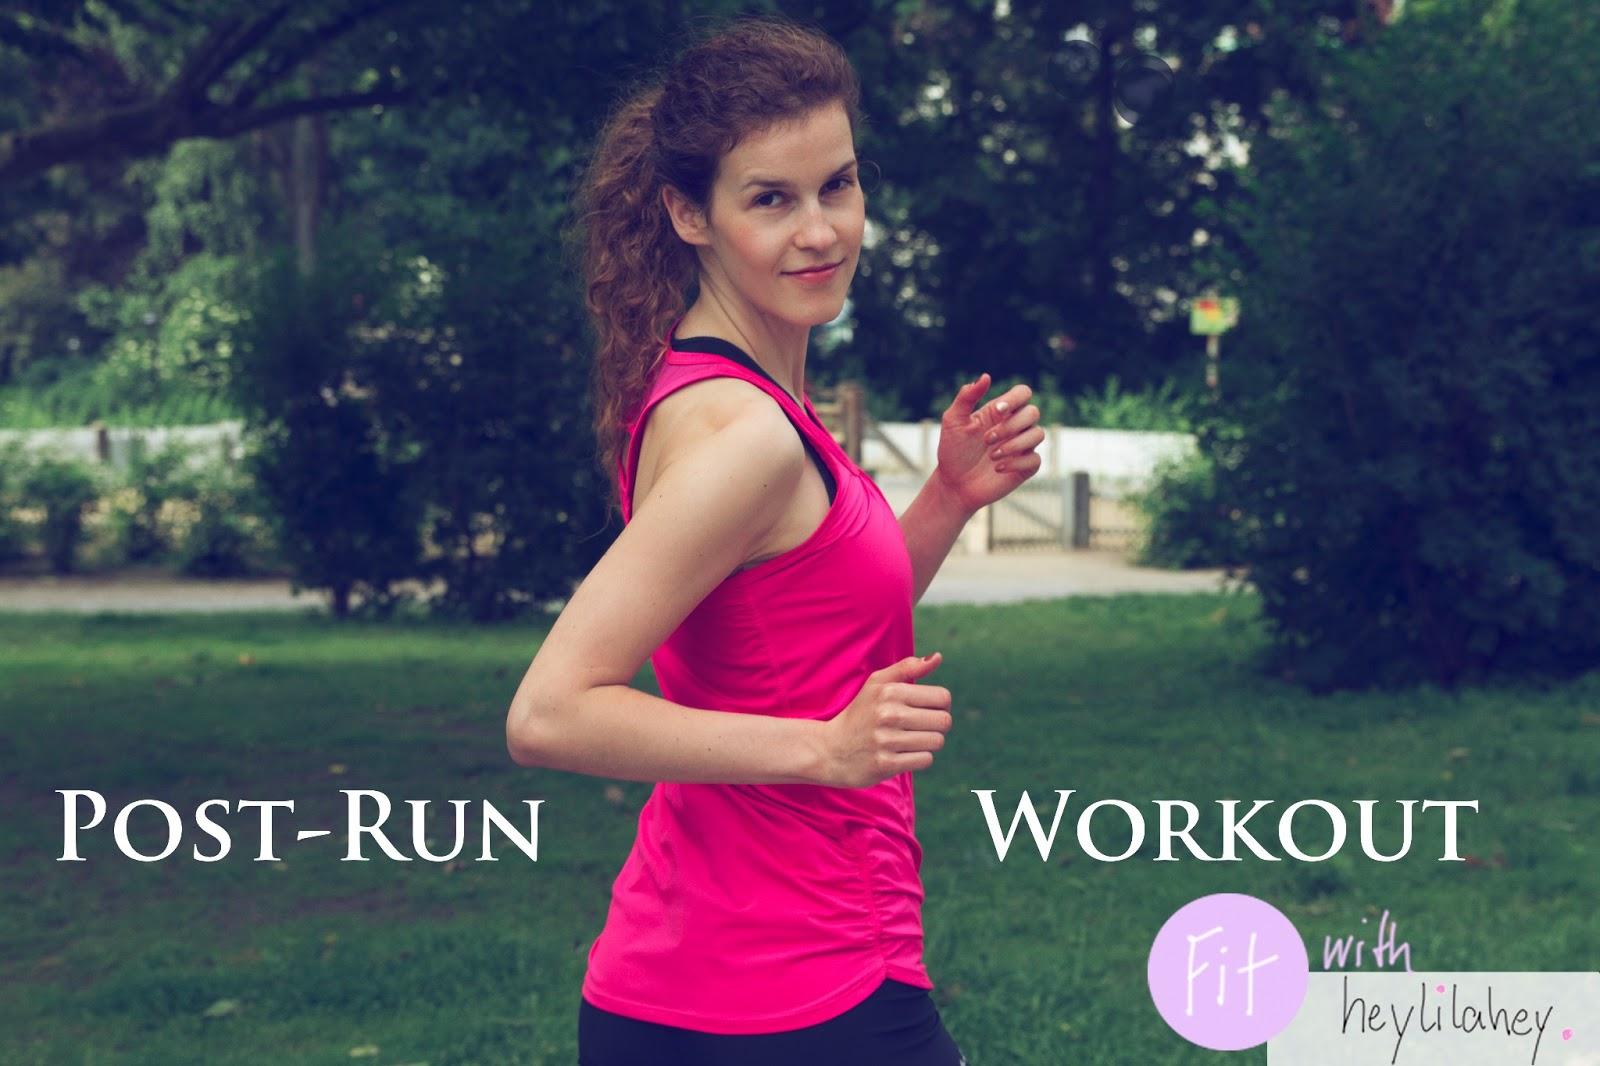 post-run workout